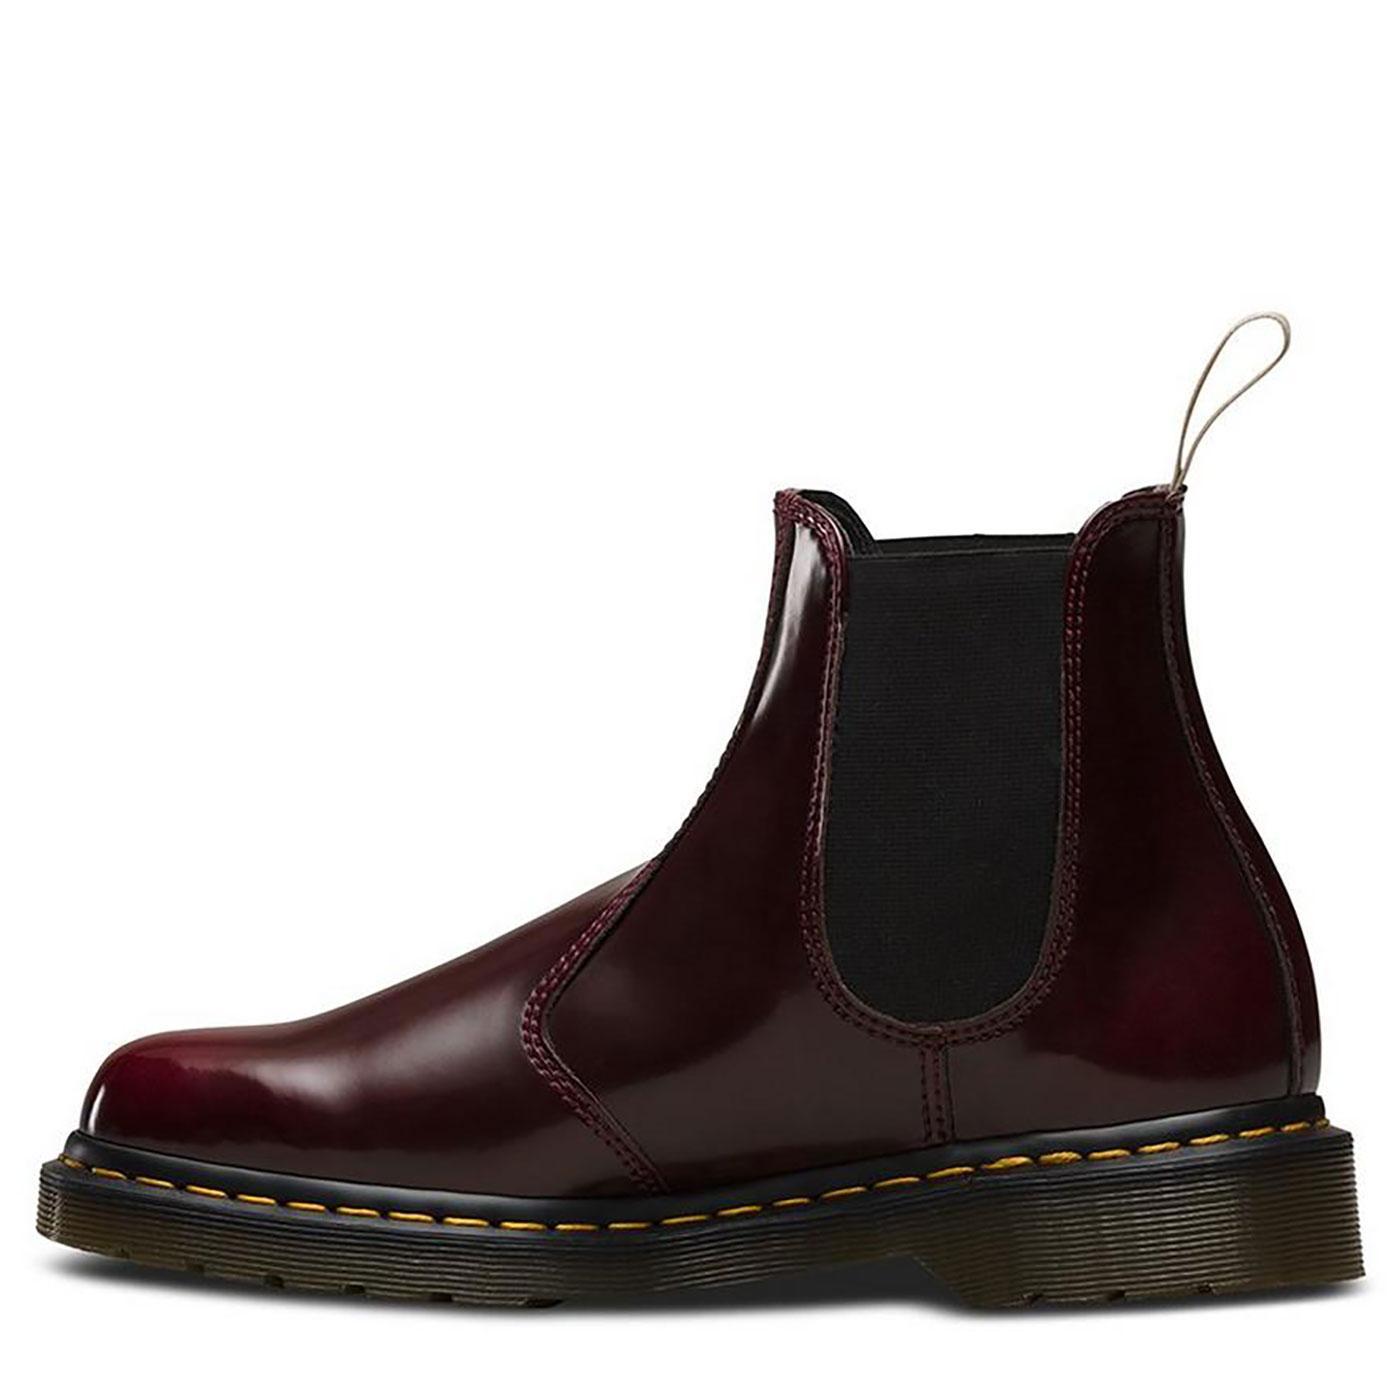 sehr günstig am besten geliebt offizieller Verkauf Vegan 2976 DR MARTENS Oxford Rub Off Chelsea Boots